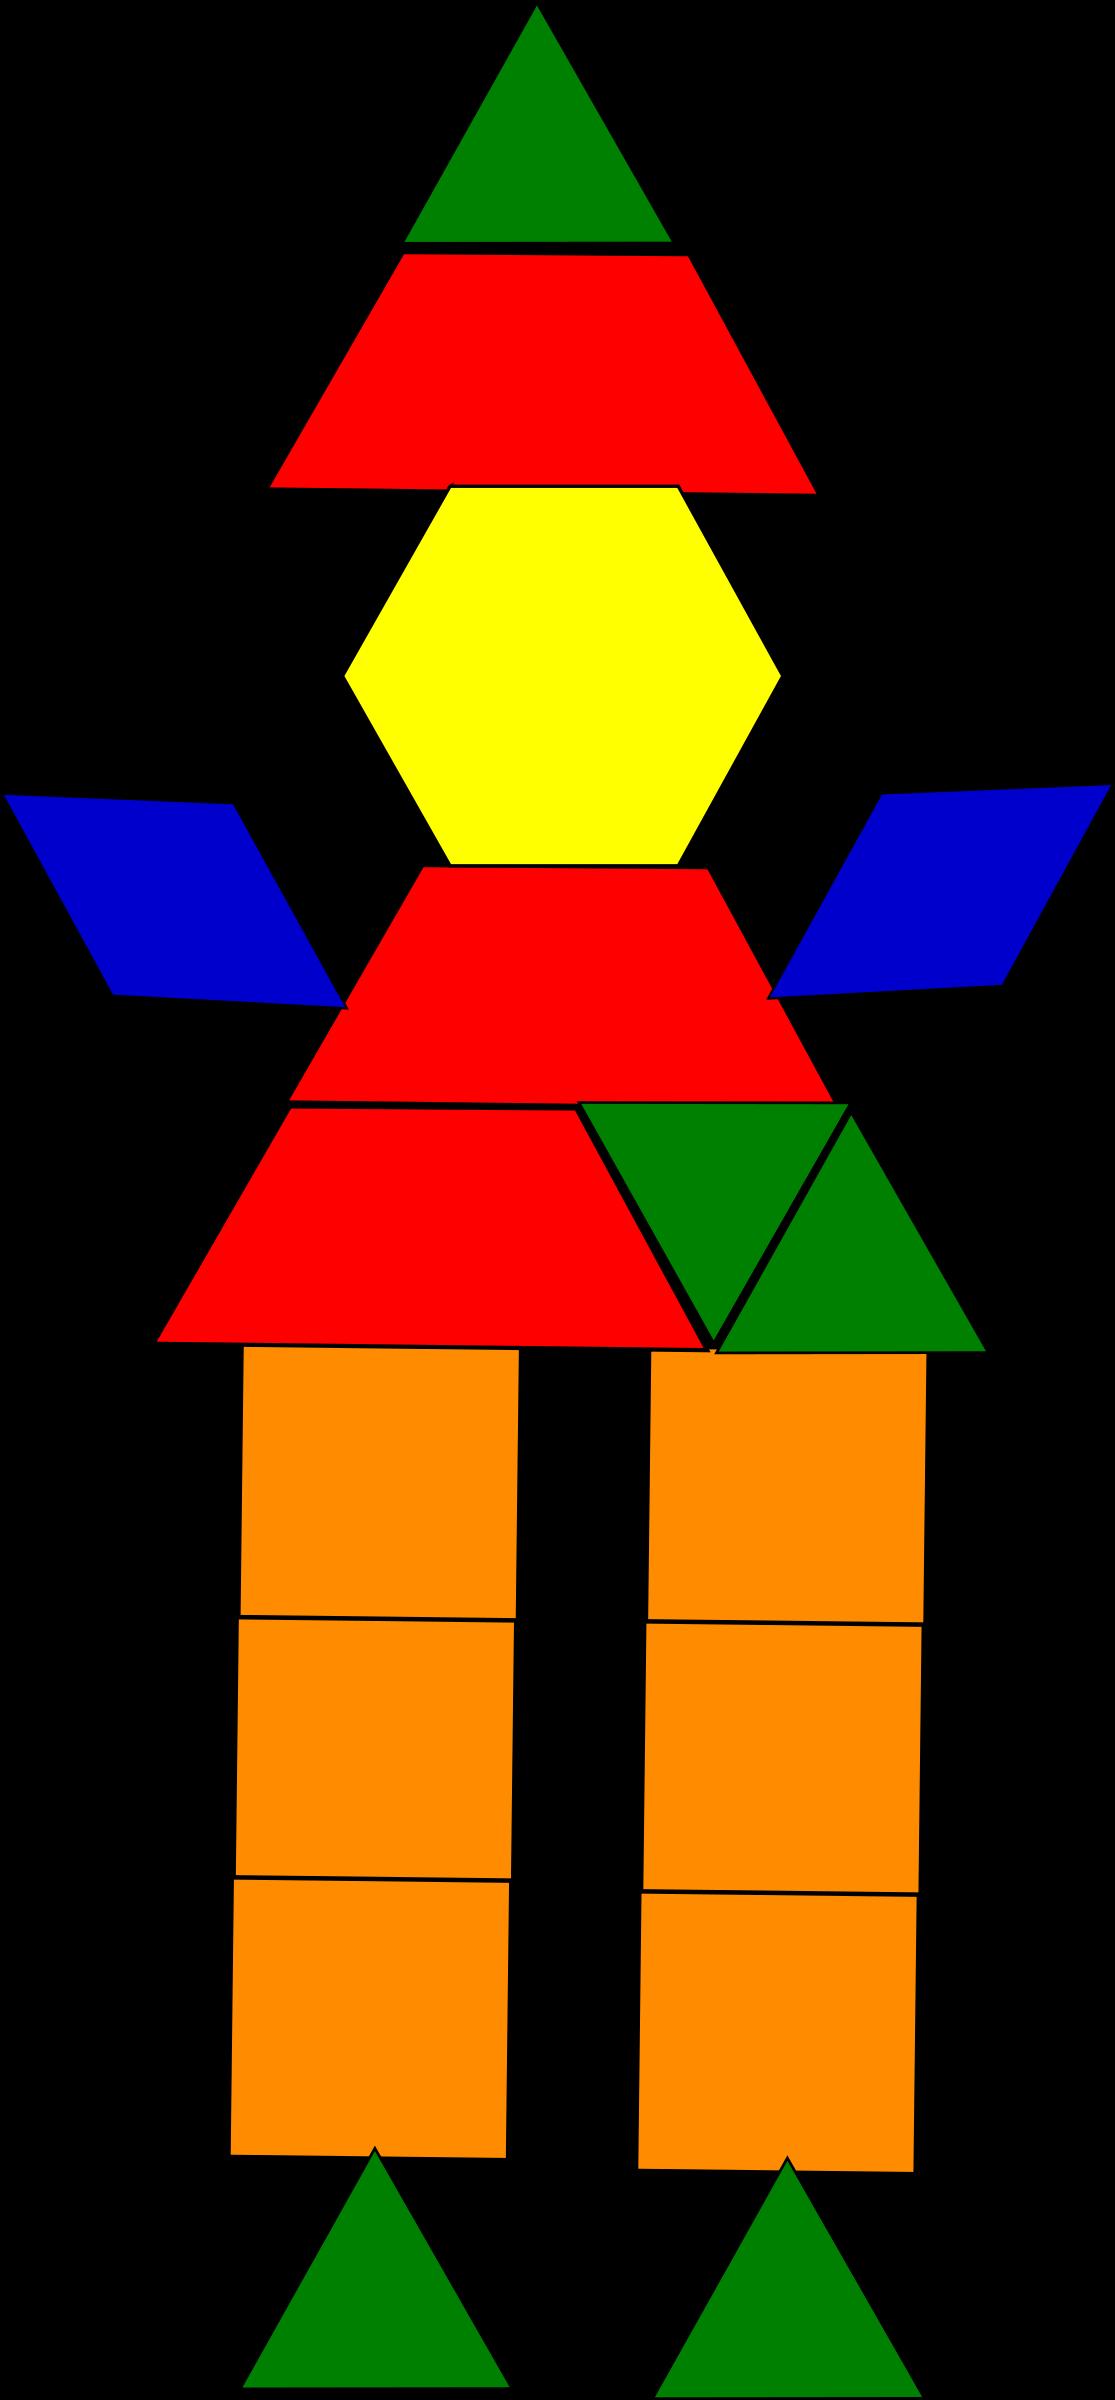 Анимация картинки, анимация из геометрических фигур картинки